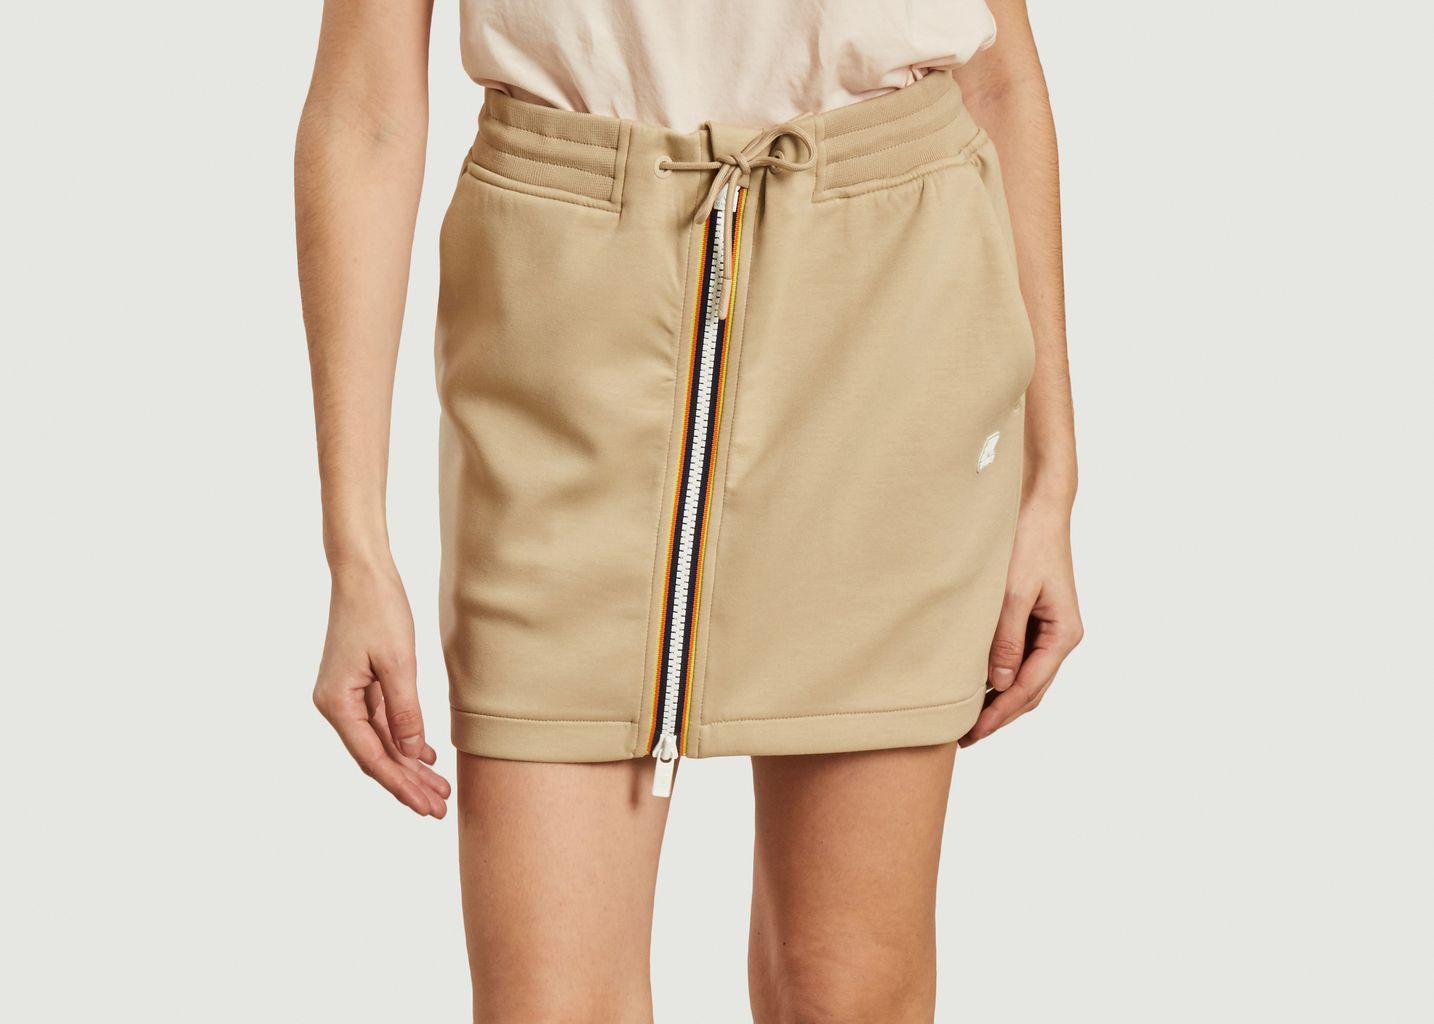 Jupe courte zippée Josette Spacer - K-Way